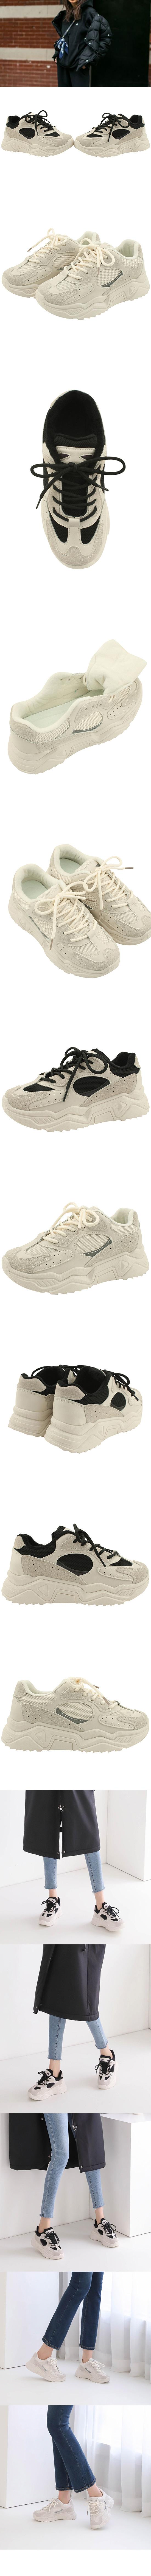 Fleece Fur Ugly Sneakers Beige